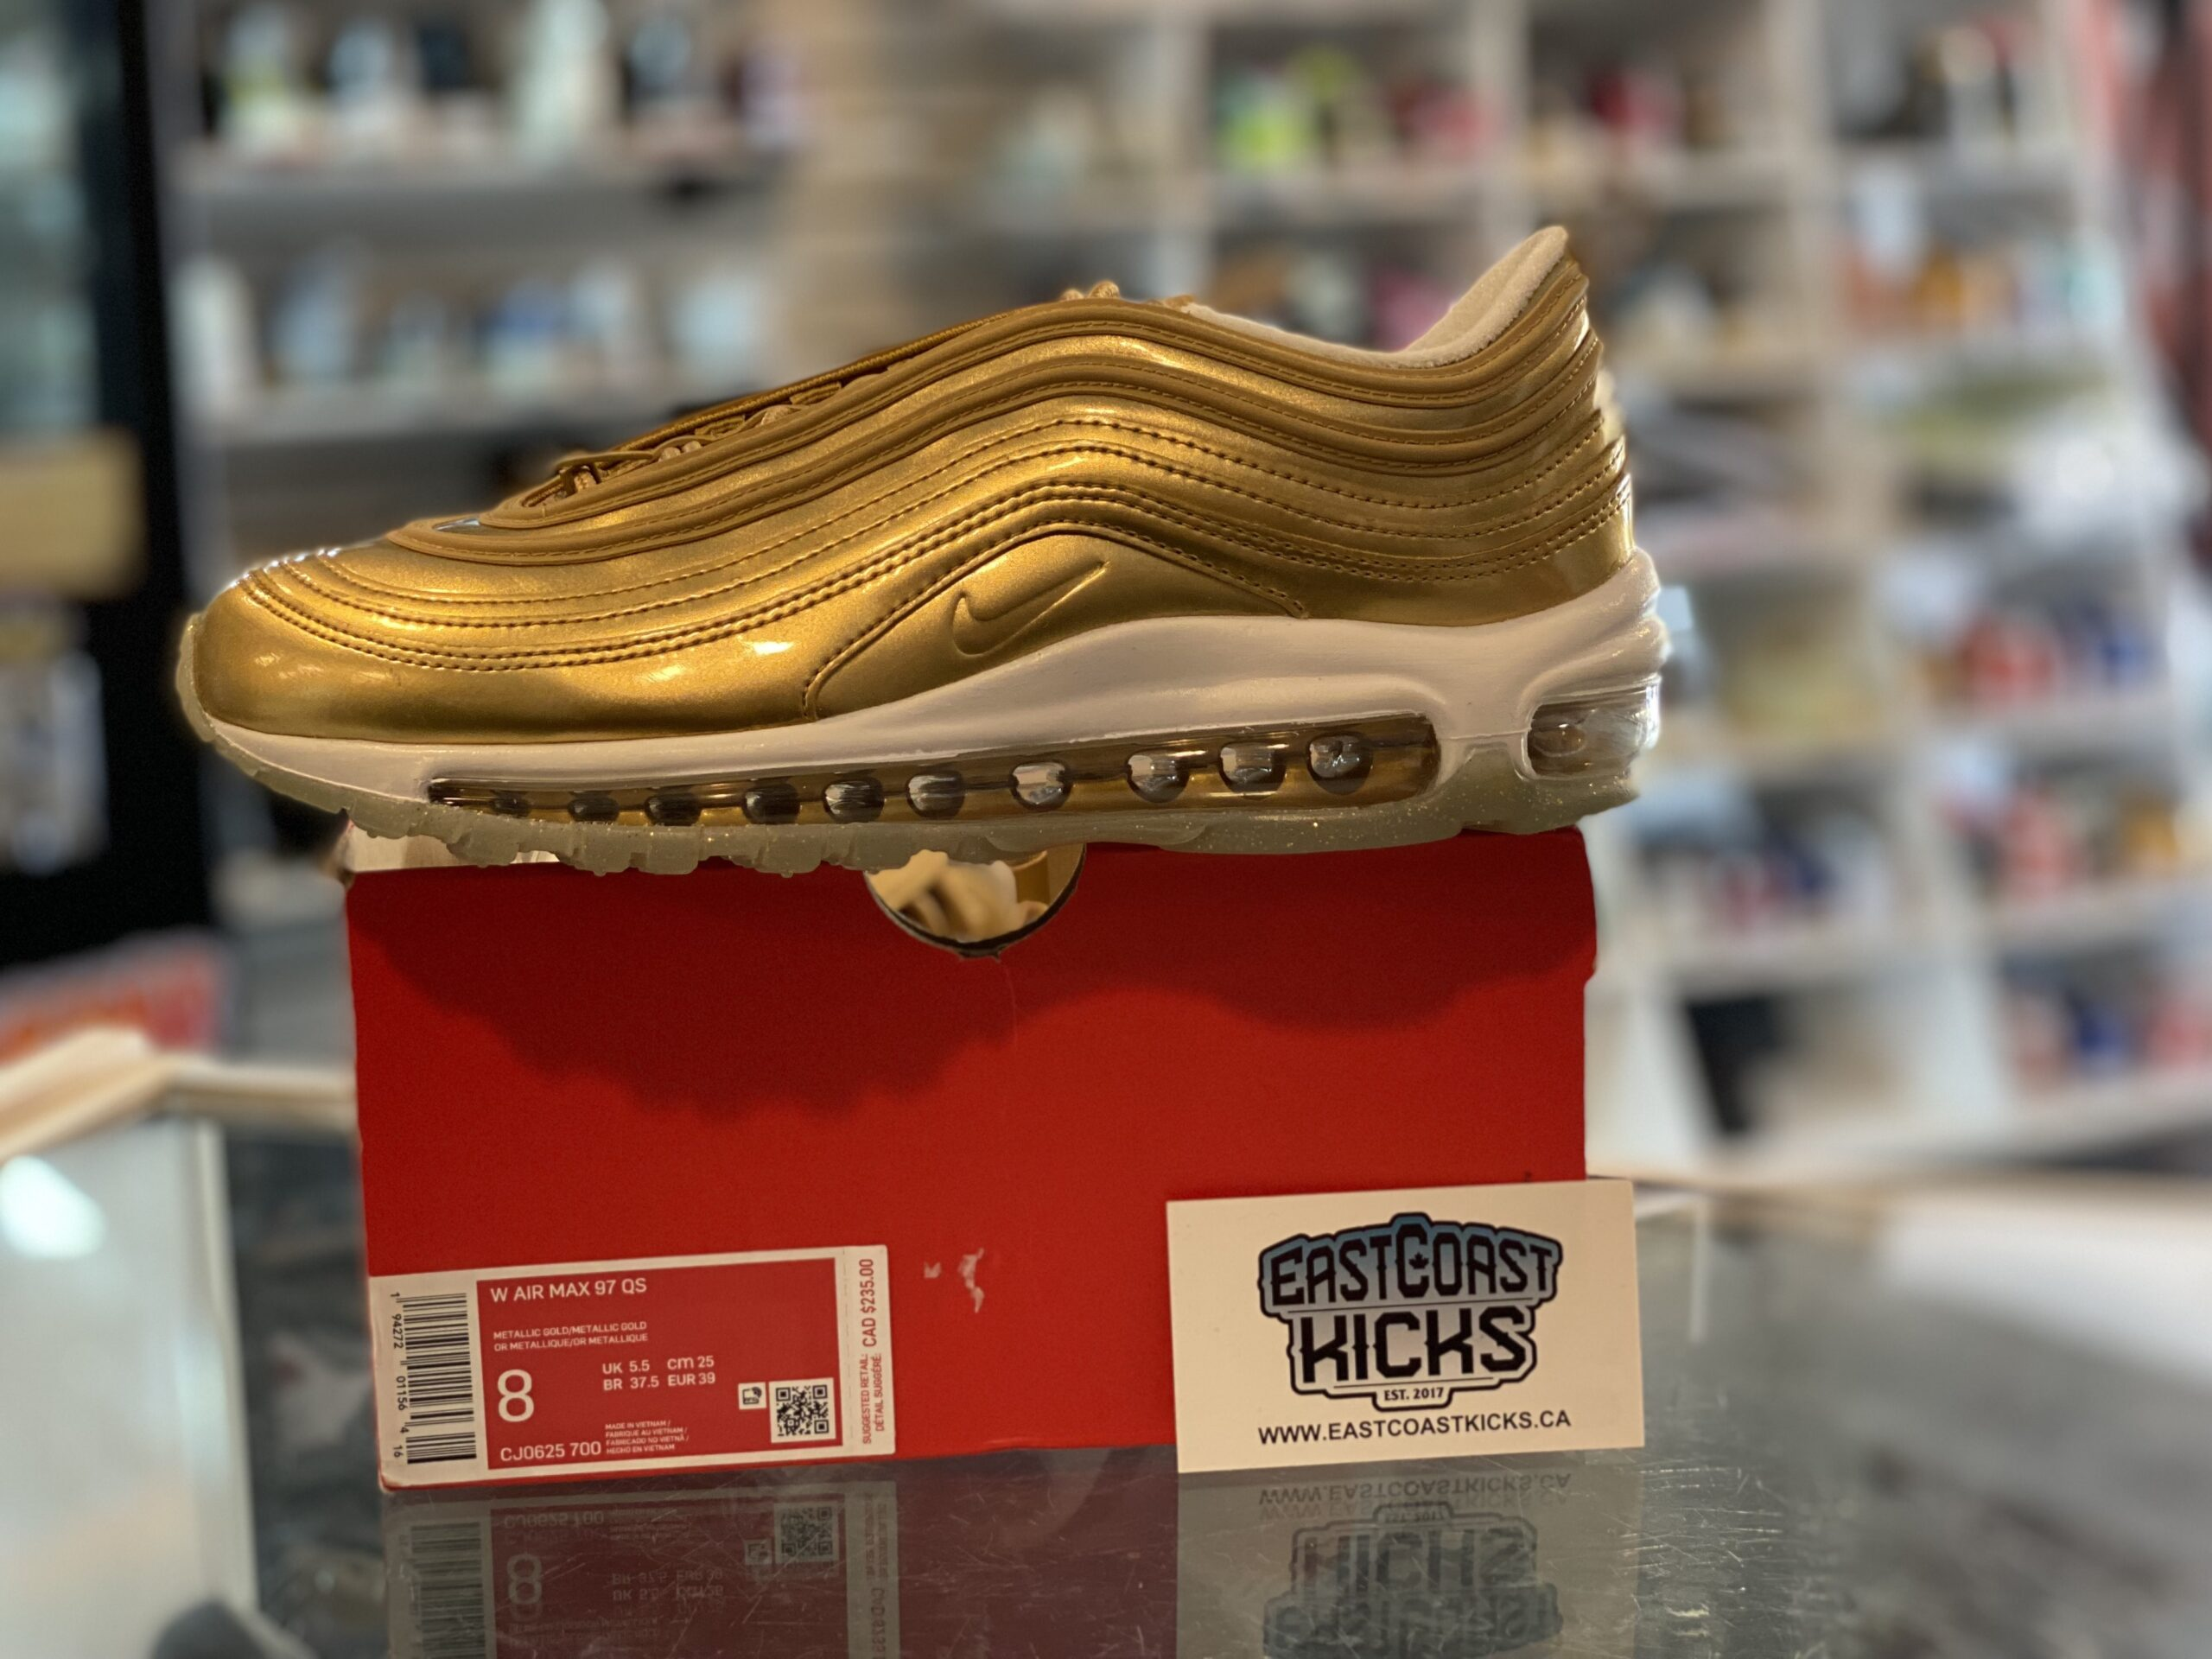 Nike Air Max 97 Gold Size 8W/6.5Y